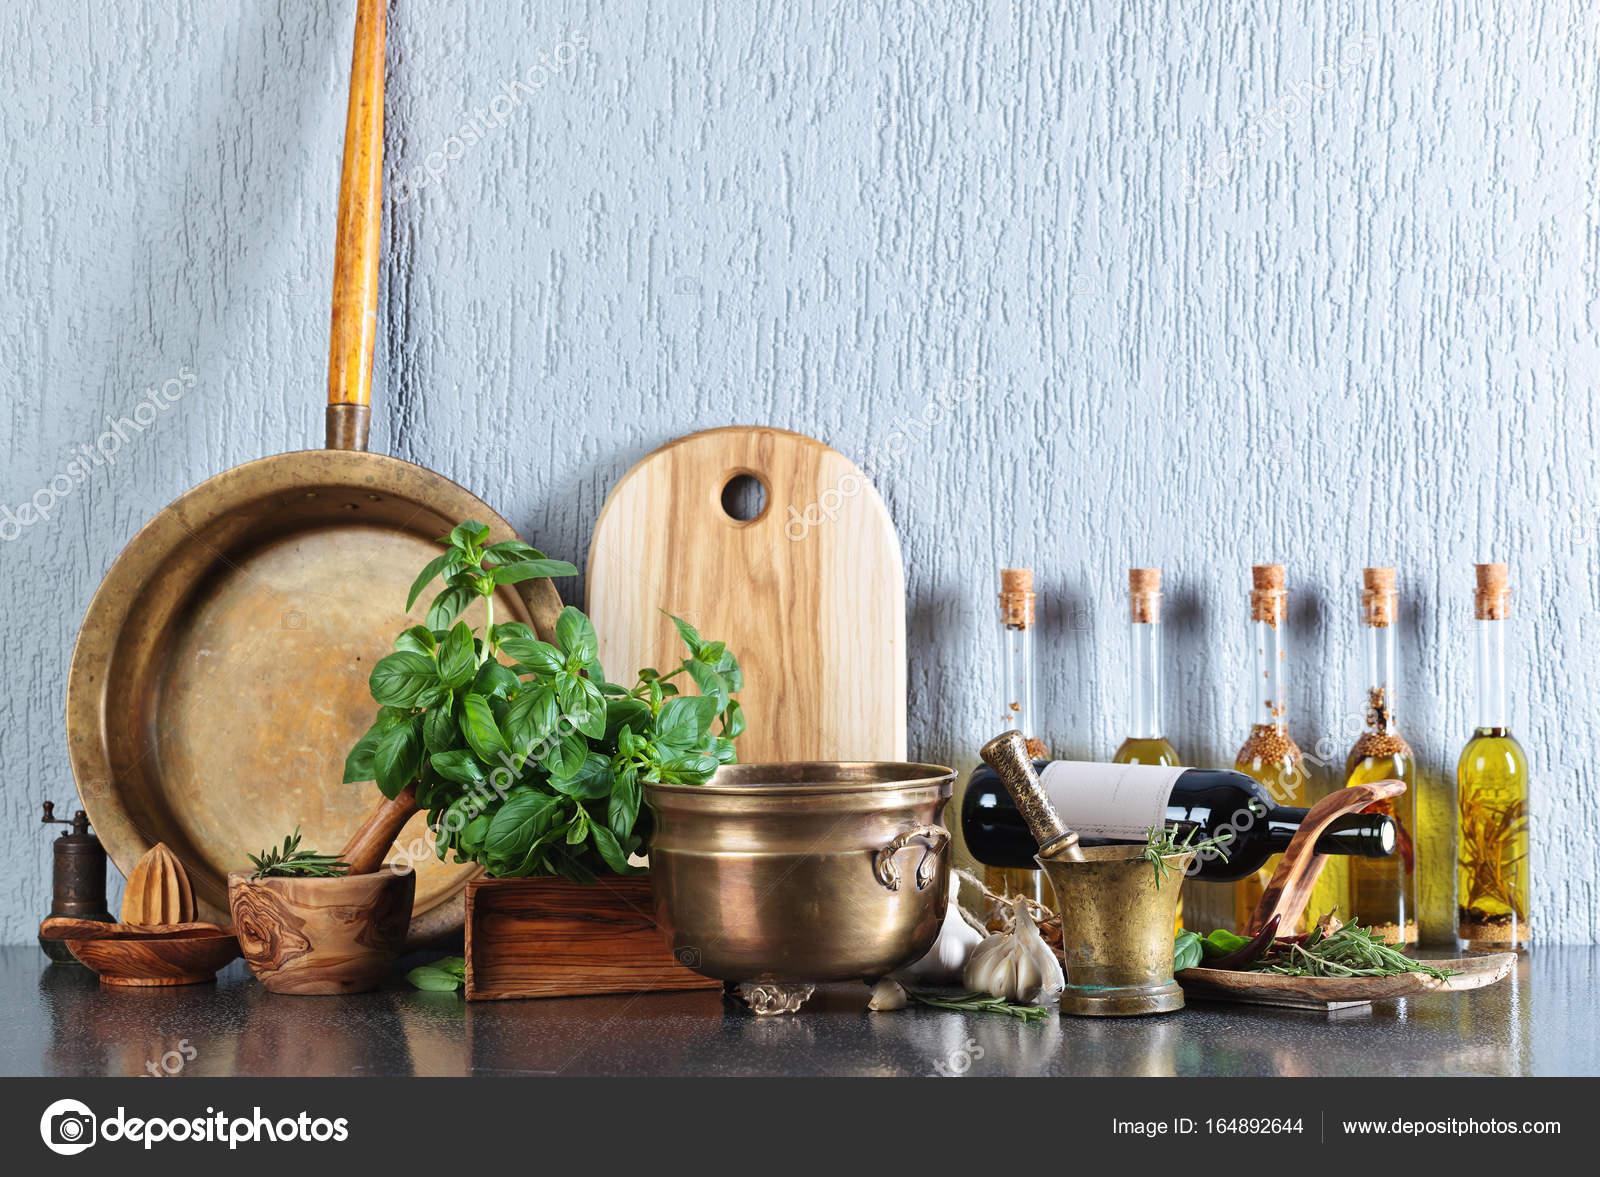 Vintage Kitchen Utensils With Bottles Of Olive Oil. U2014 Stock Photo